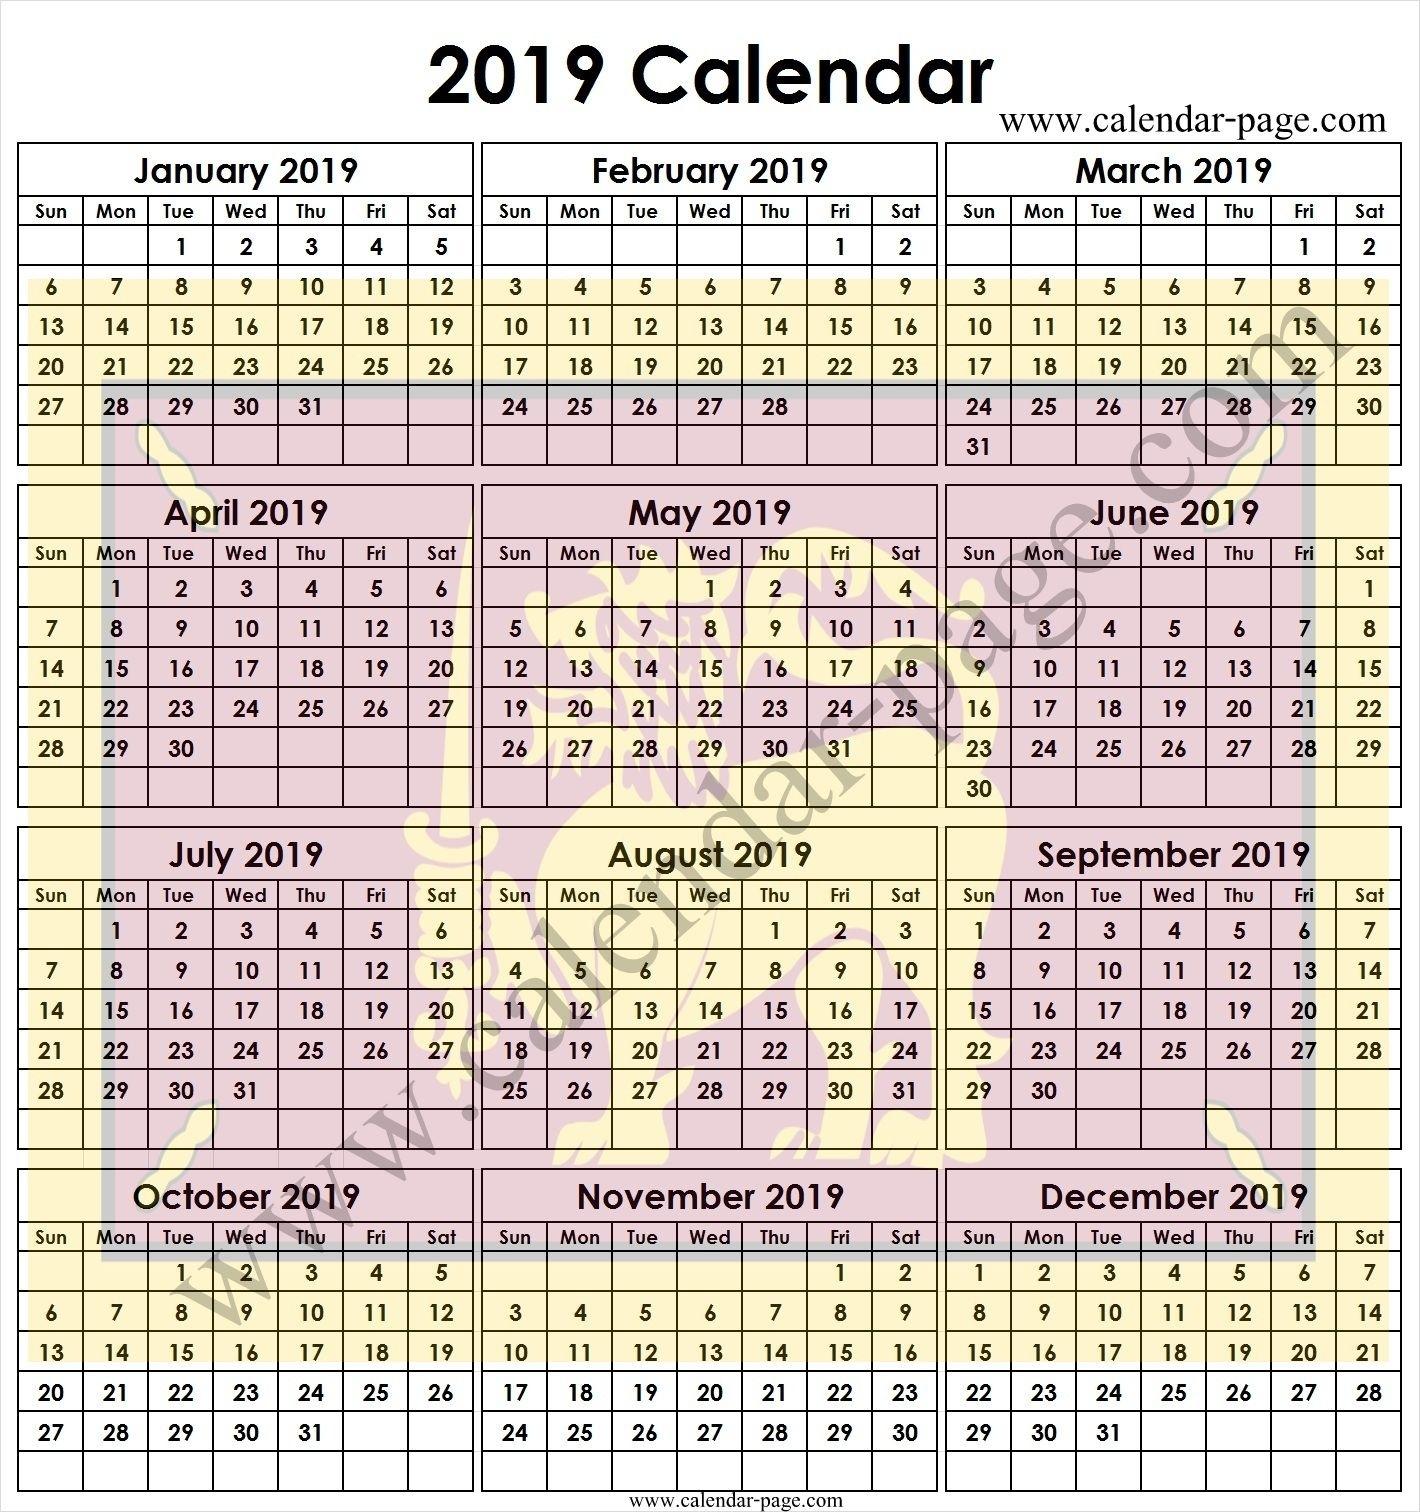 School Calendar 2019 Sri Lanka | 2019 Calendar Template | School Calendar Month In Sinhala